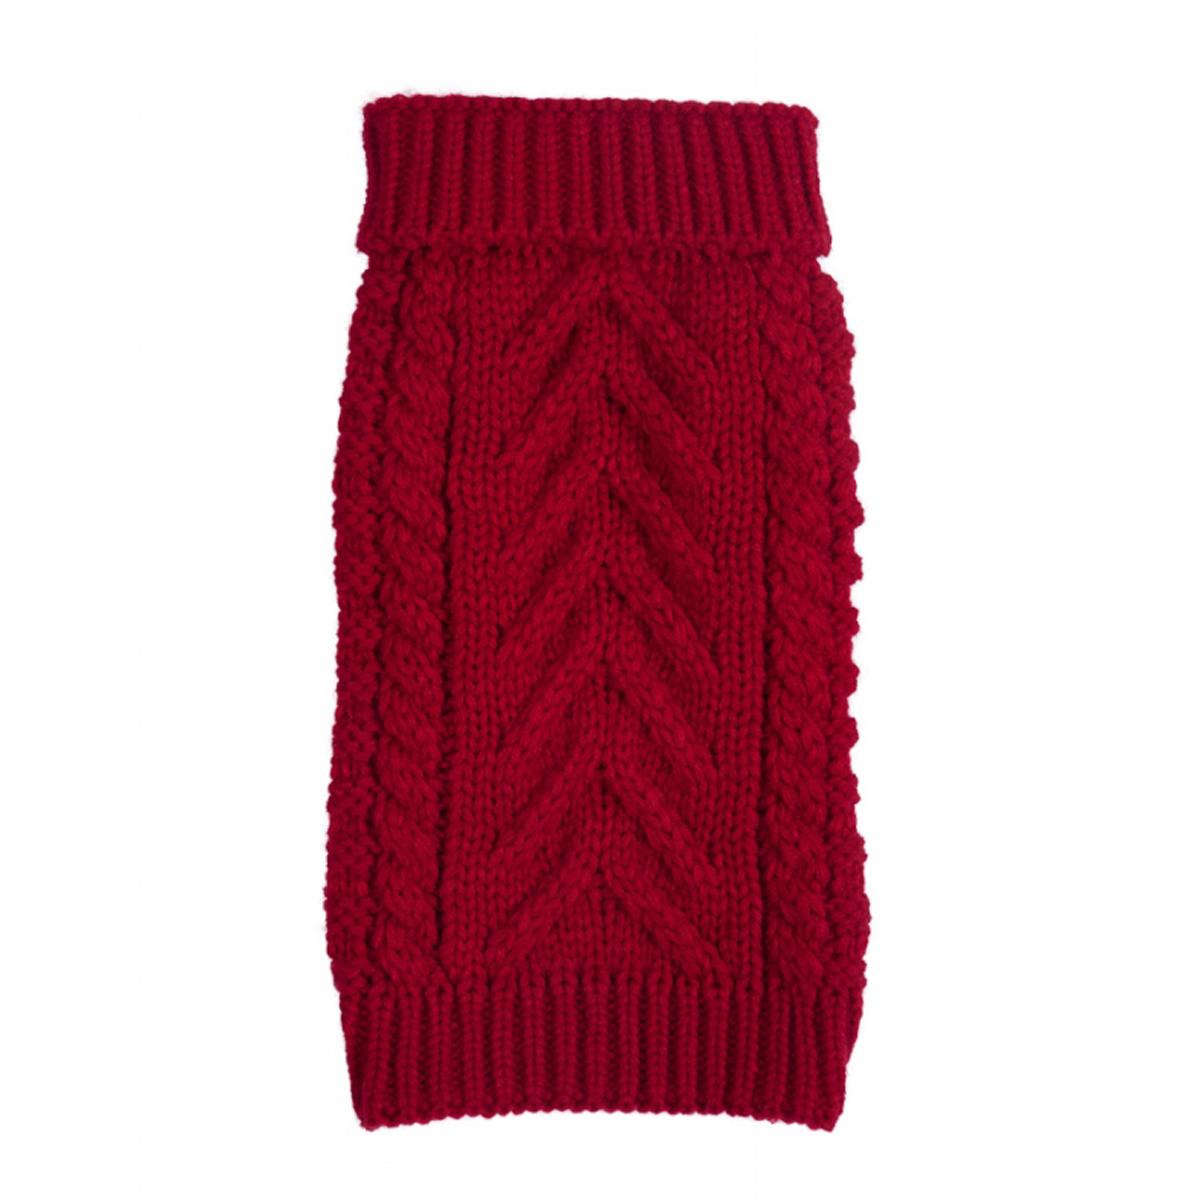 fabdog® Chunky Turtleneck Dog Sweater - Red